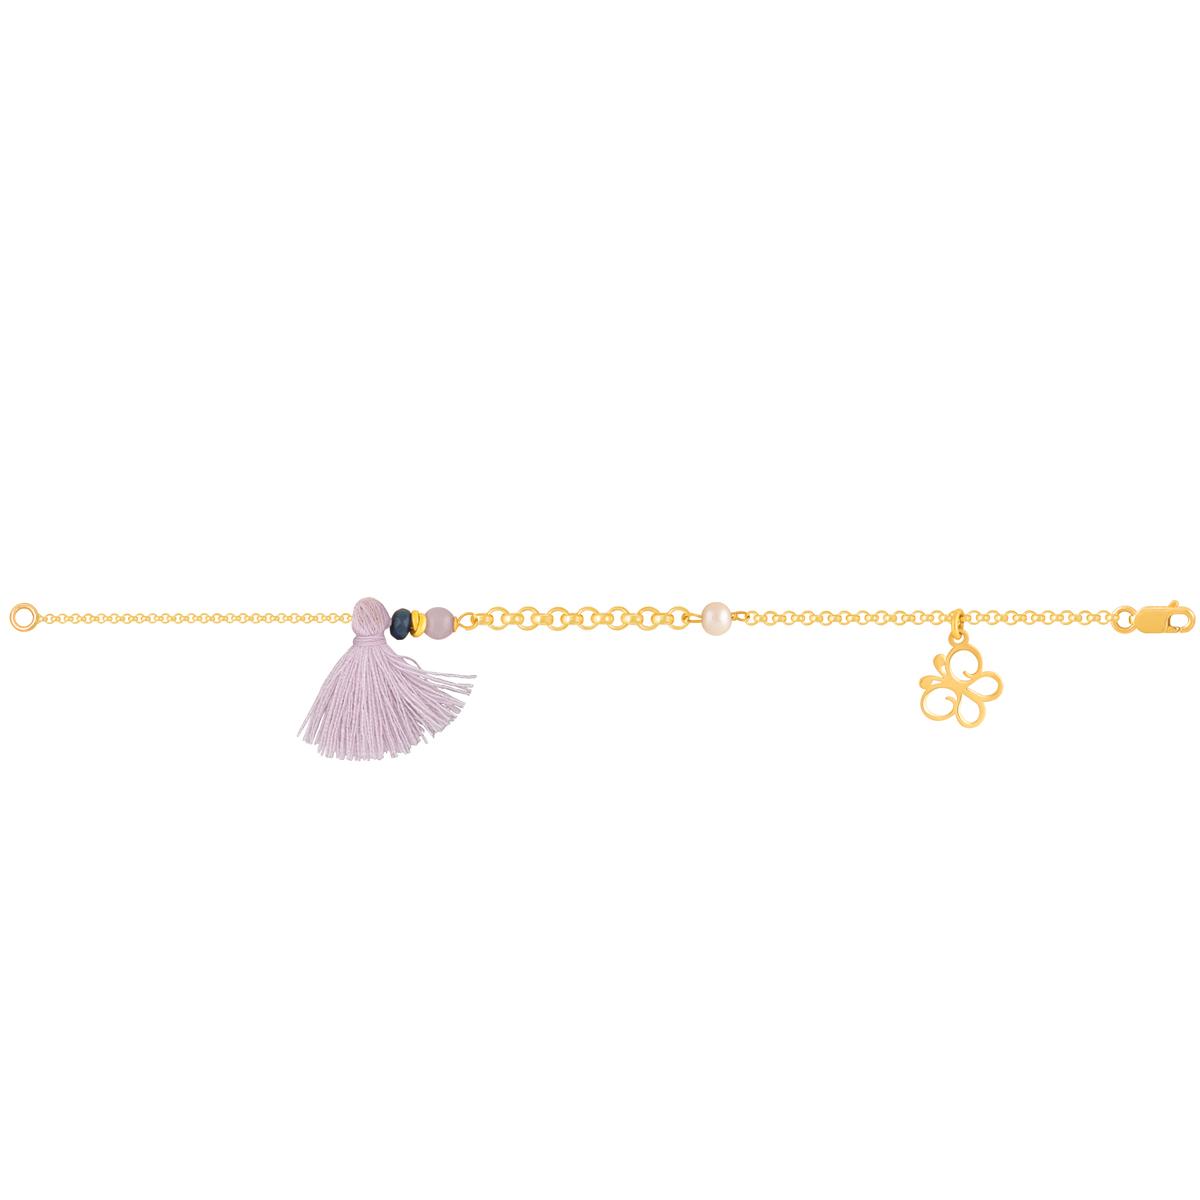 پابند طلا پروانه و منگوله